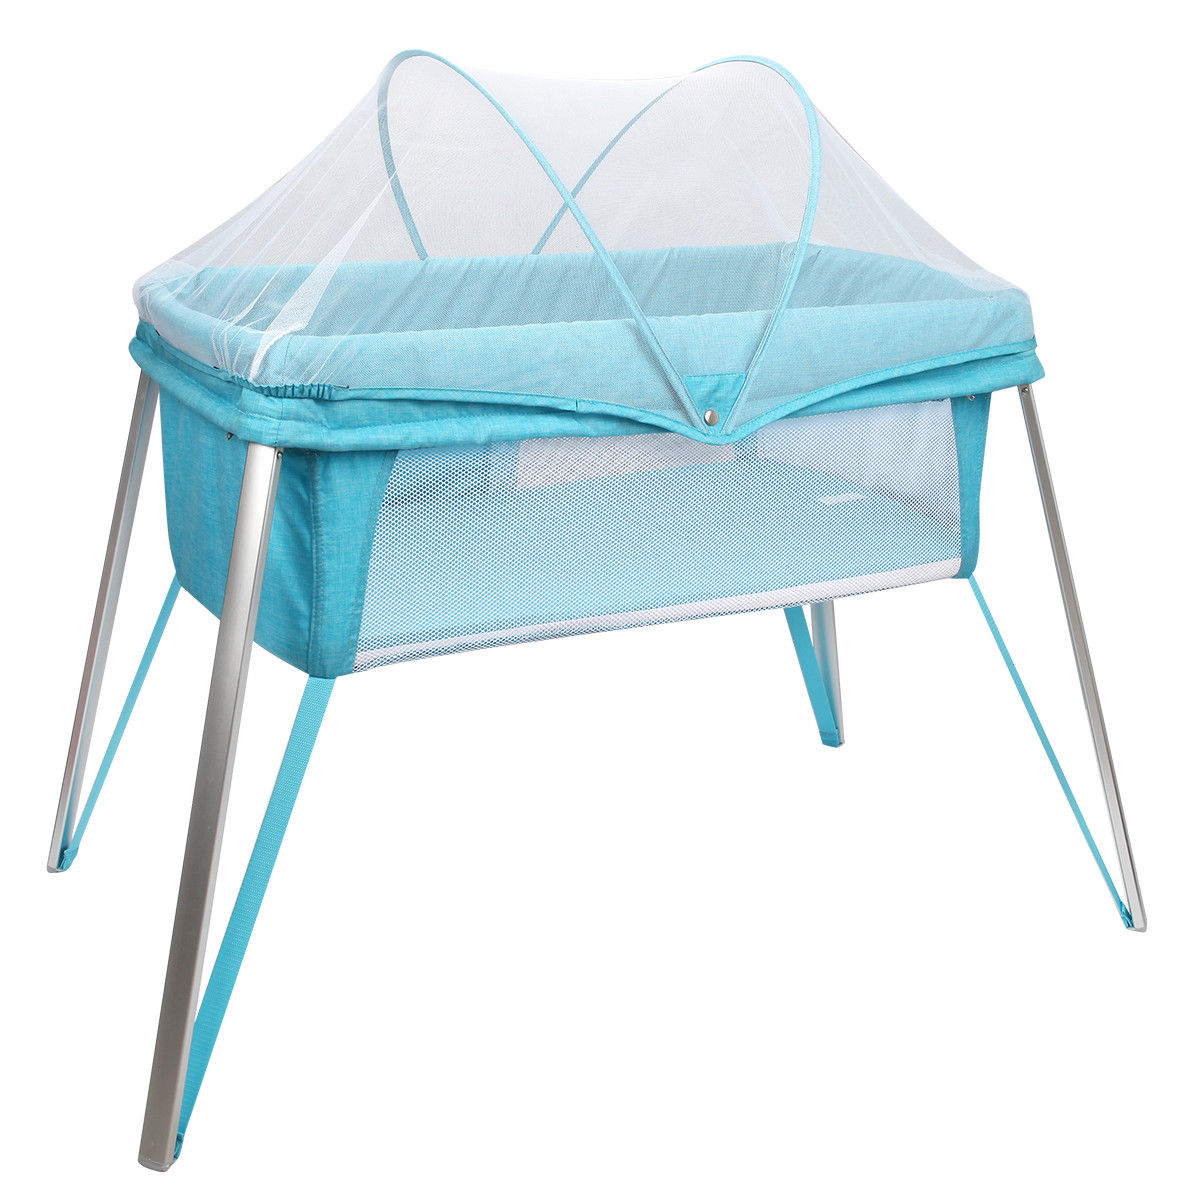 GHP 33-Lbs Capacity Blue Aluminum Alloy Legs & Oxford Fabric Cloth Baby Crib Bassinet by Globe House Products